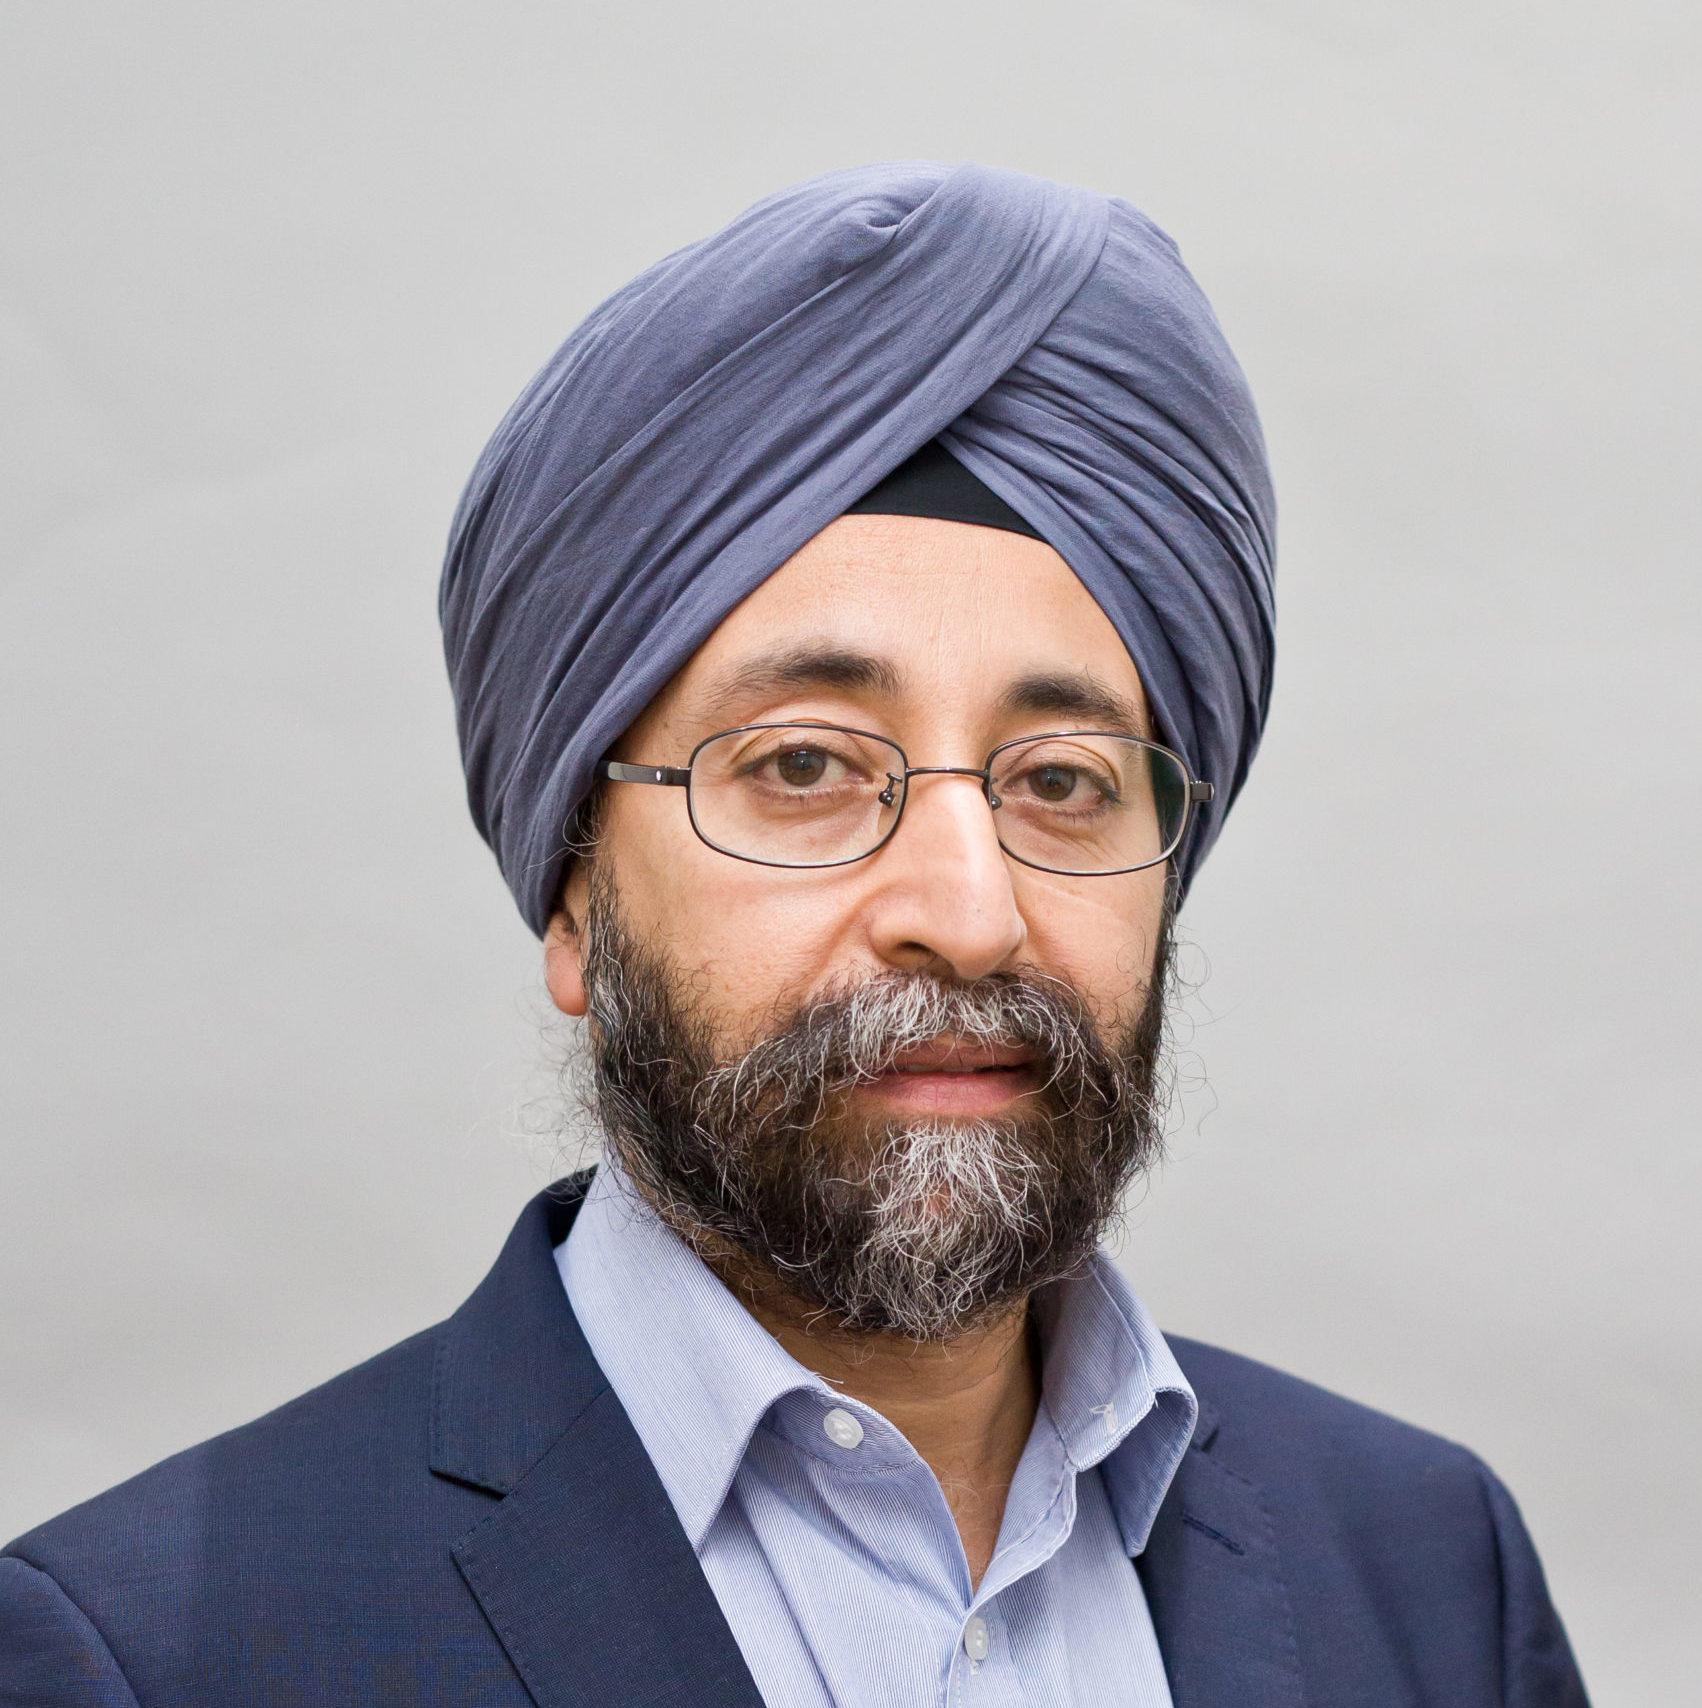 Harjeet Narula